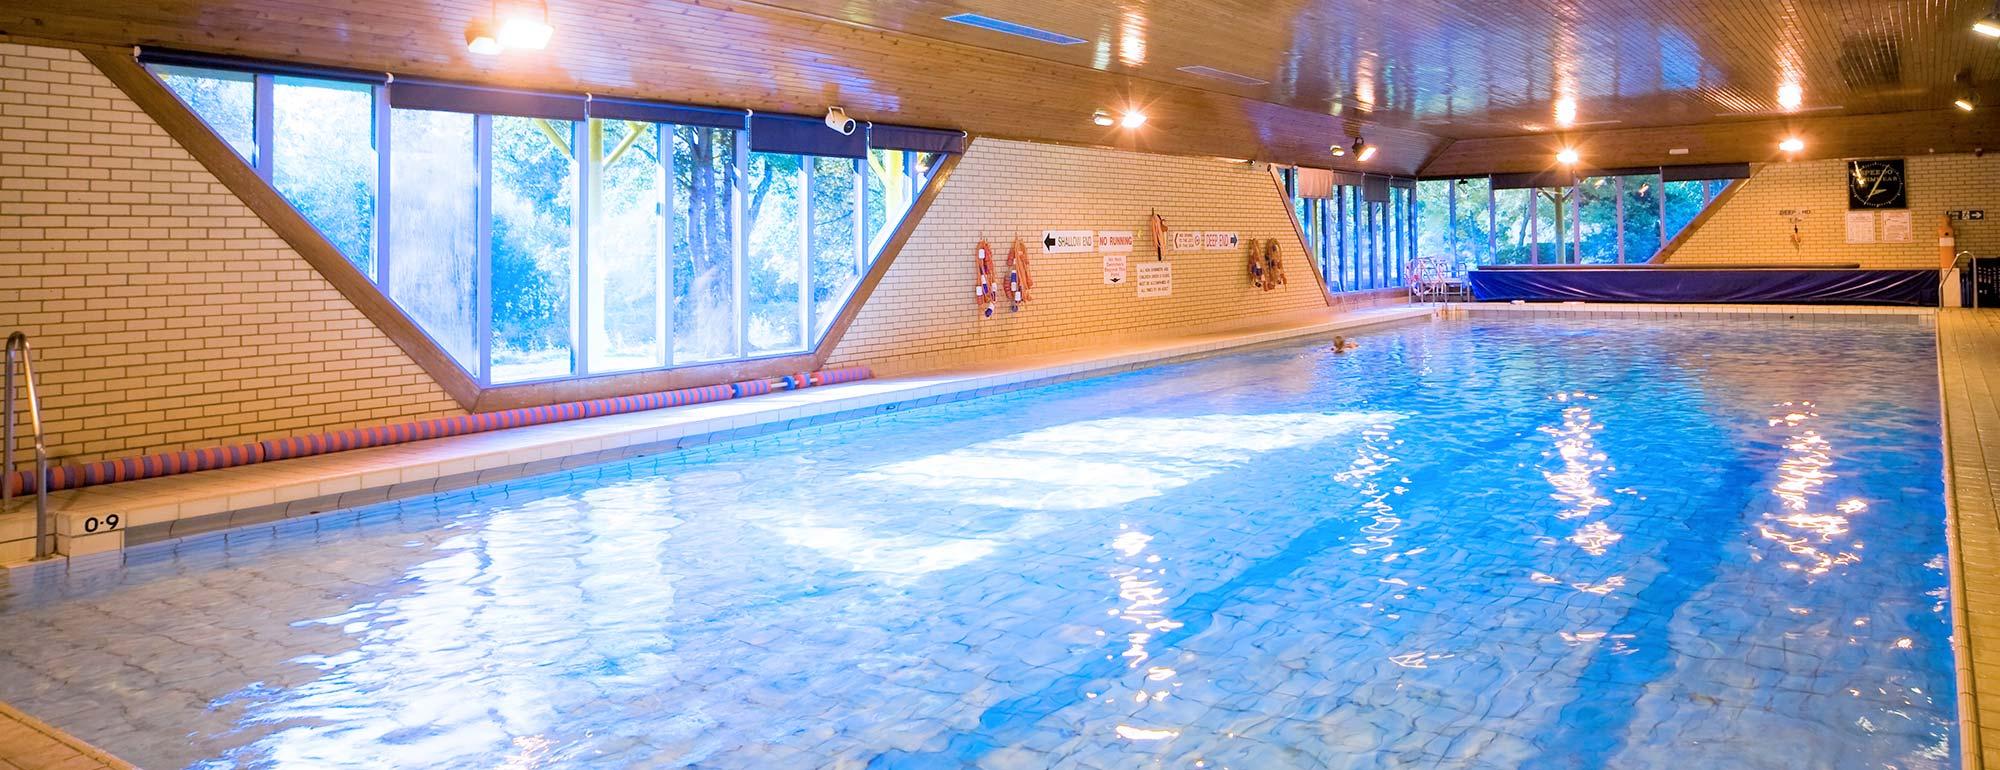 Peebles Swimming Pool | Swimming Pools | Live Borders